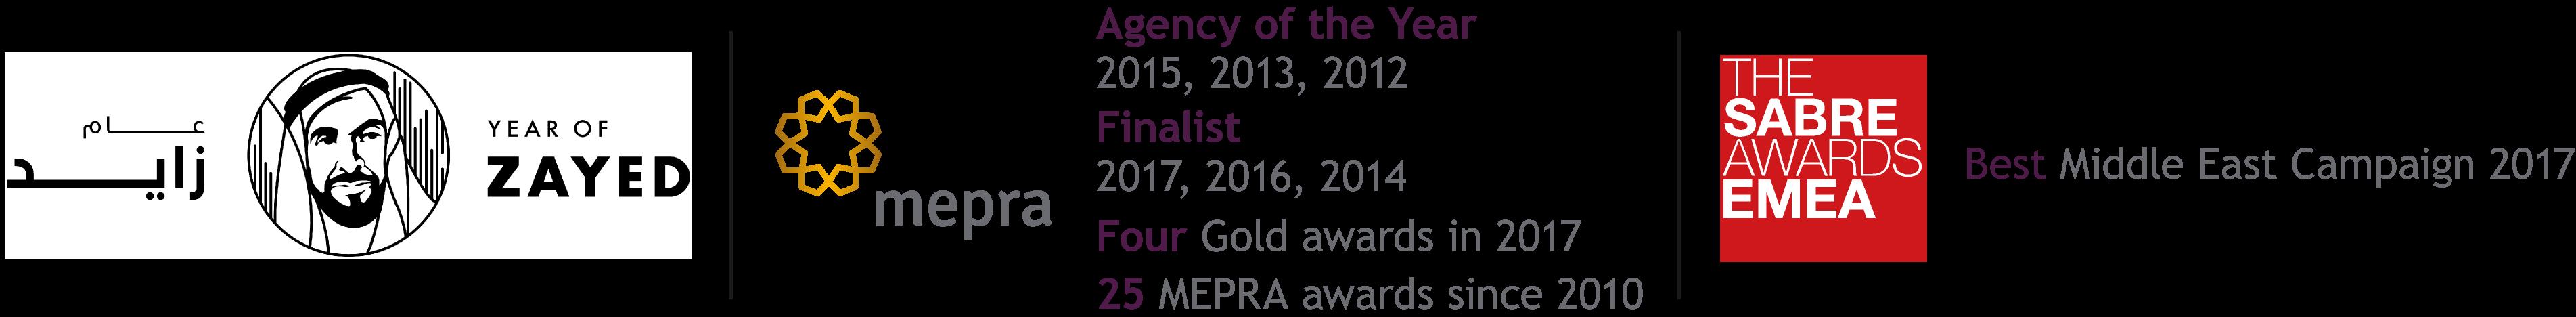 The Year of Zayed - MEPRA Award winners - SABRE Awards EMEA winner